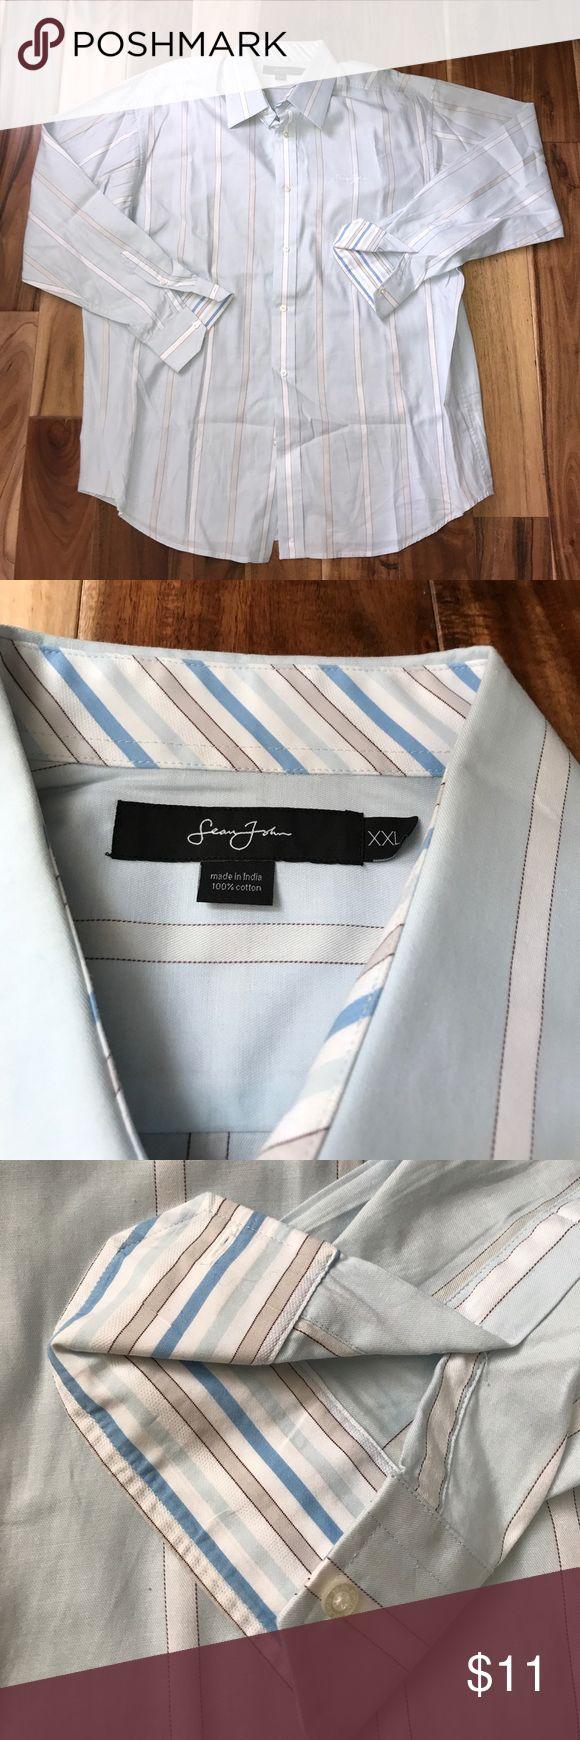 Men's dress shirt Sean John Sz XXL Only worn once. Sz XXL. By Sean Jean. In excellent condition, no flaws. Sean John Shirts Dress Shirts